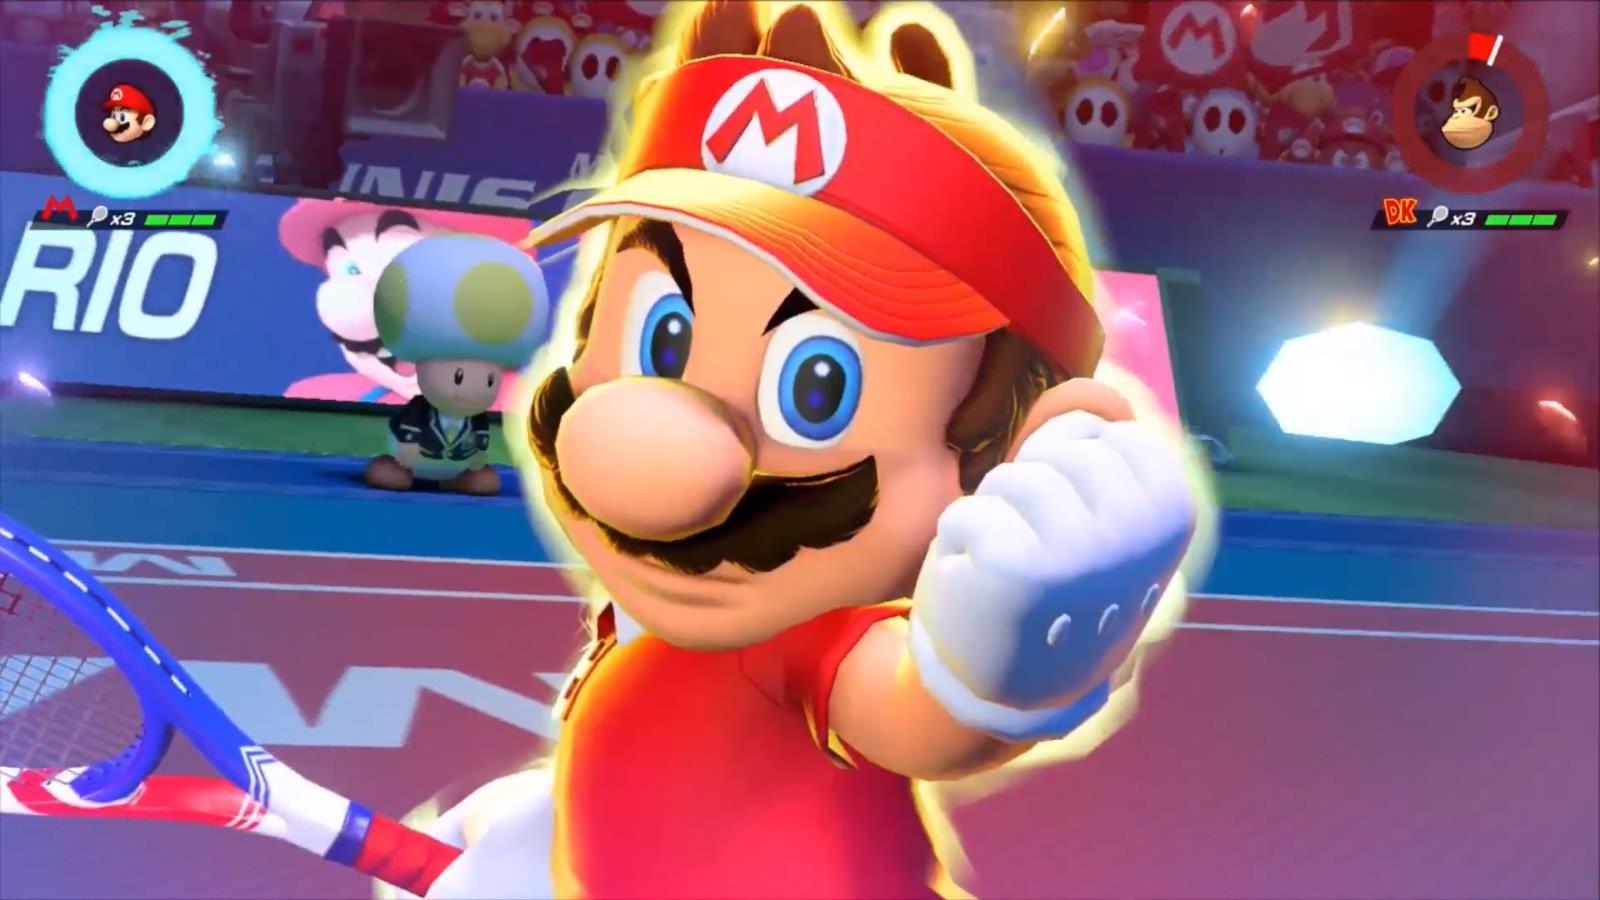 Mario Tennis Aces GRATIS miembros Nintendo Switch Online 7-13 de agosto